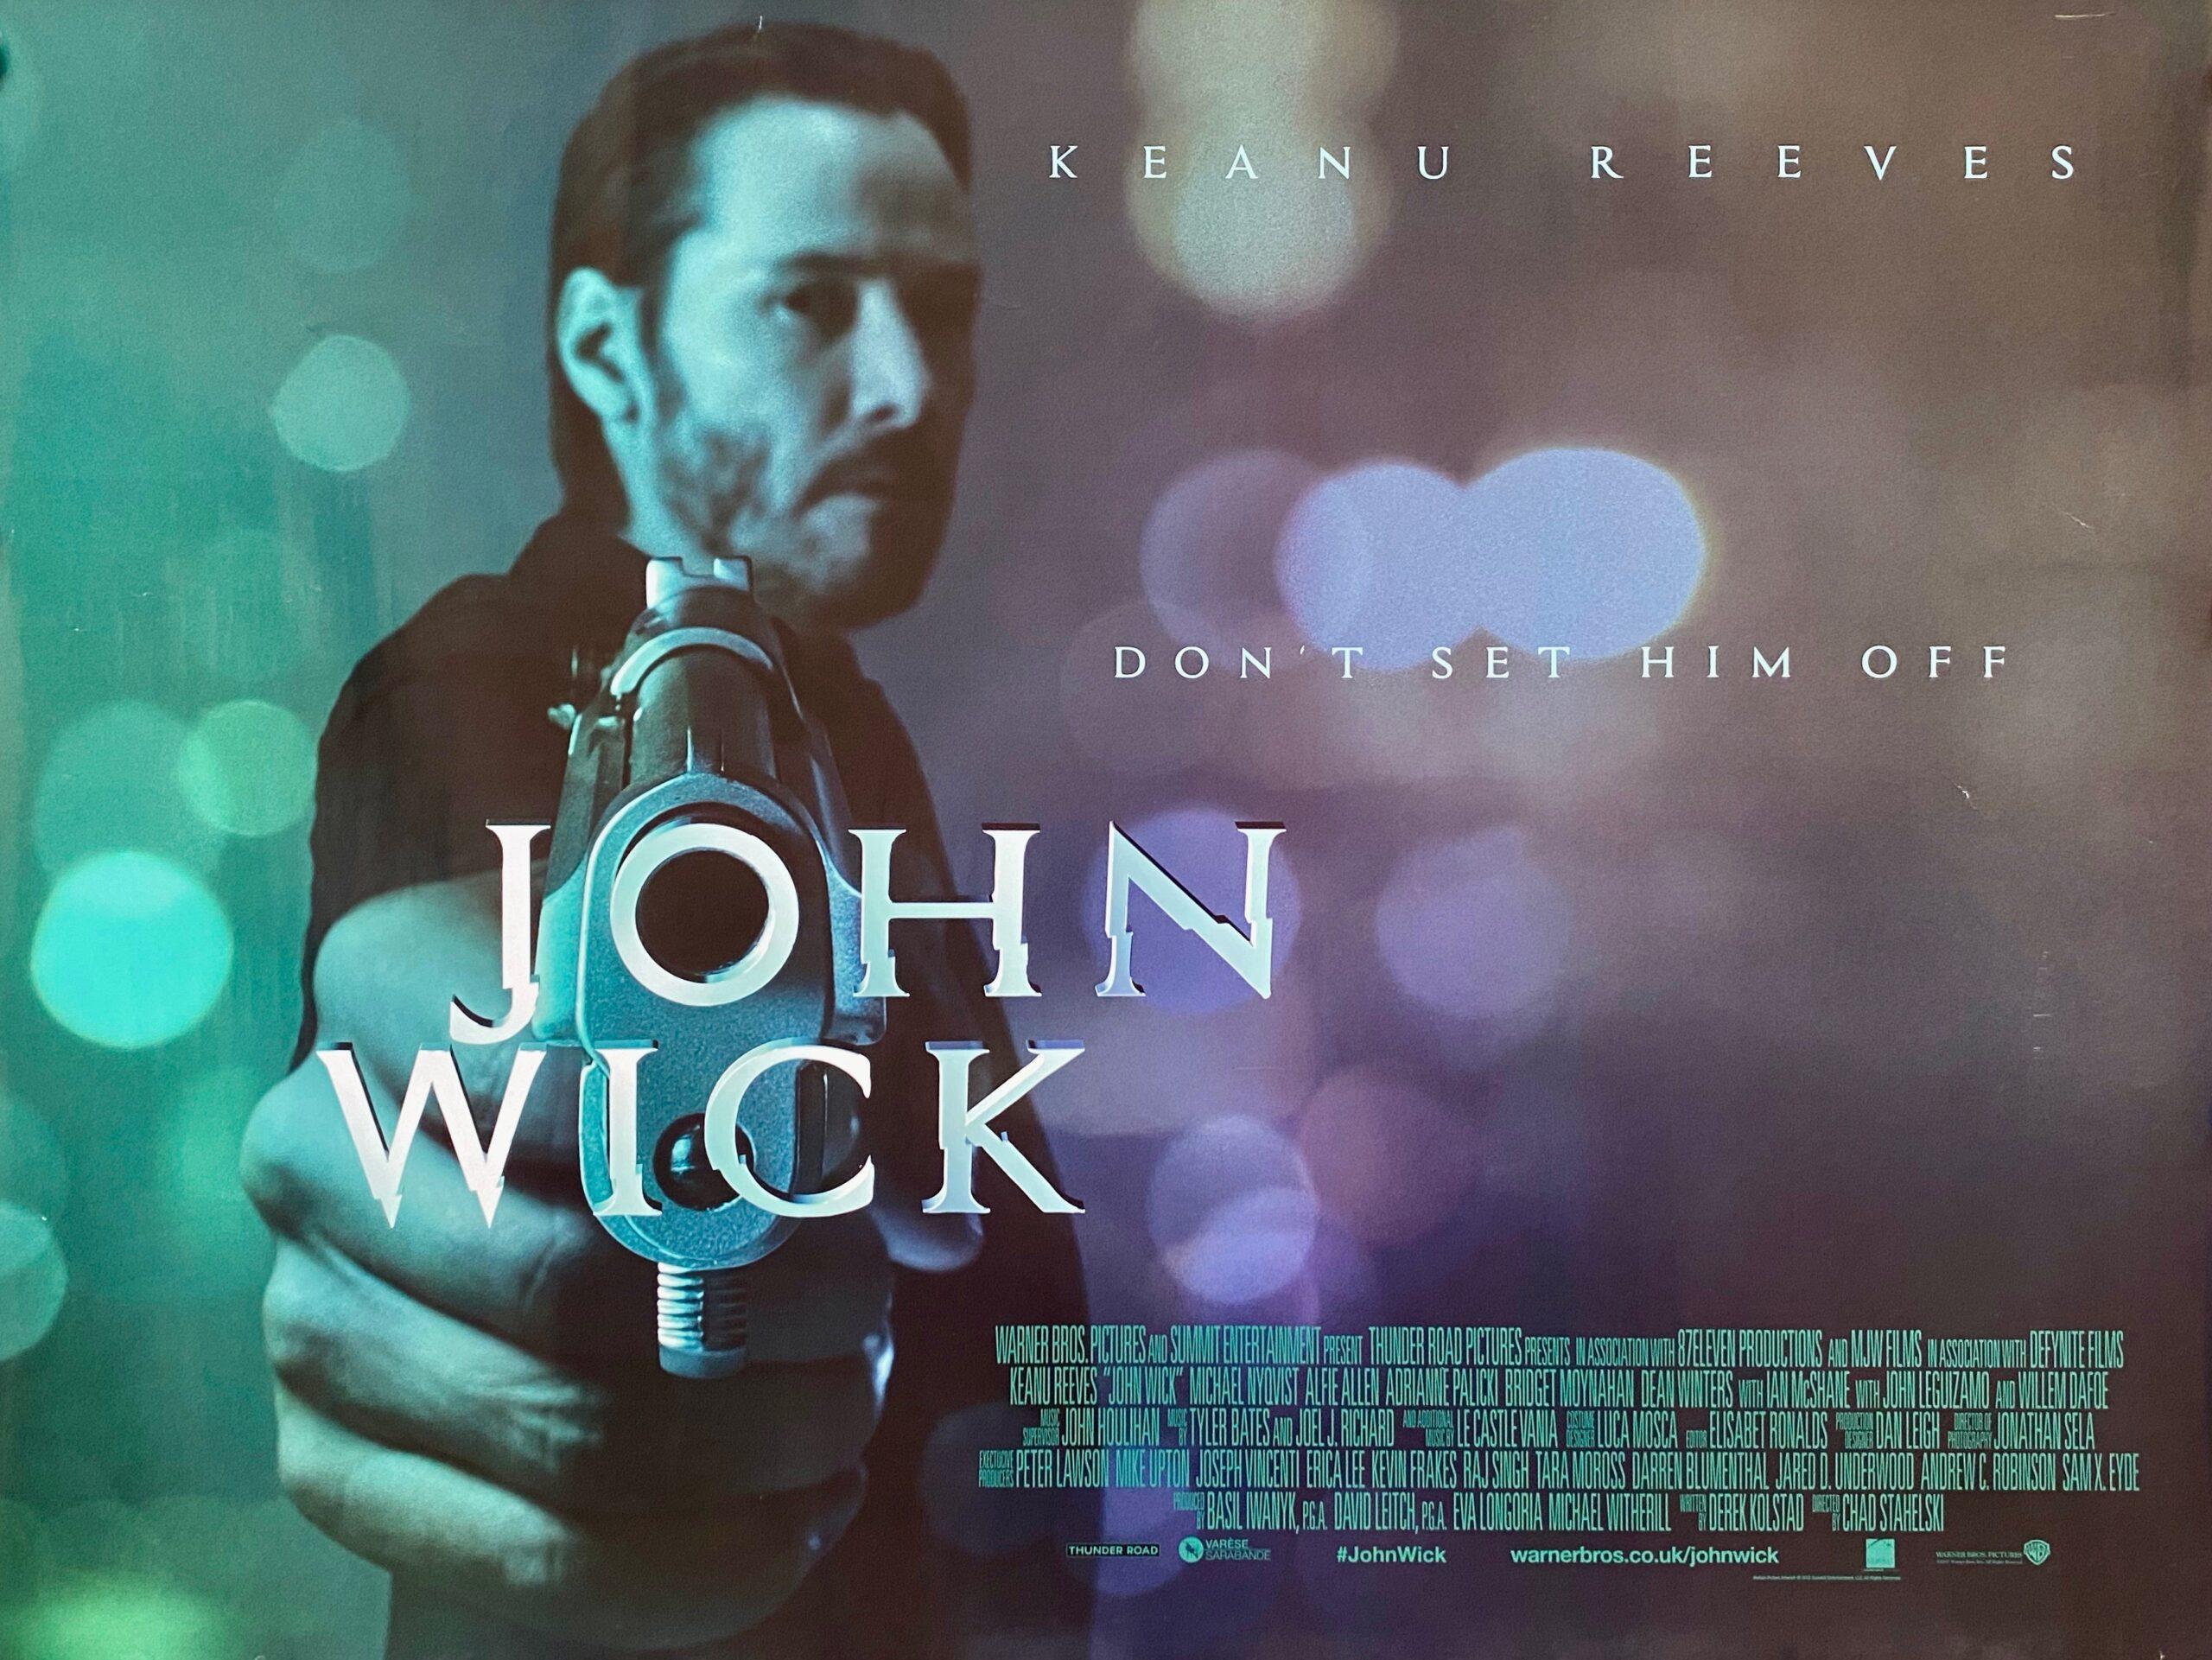 Original John Wick Movie Poster Keanu Reeves Chad Stahelski